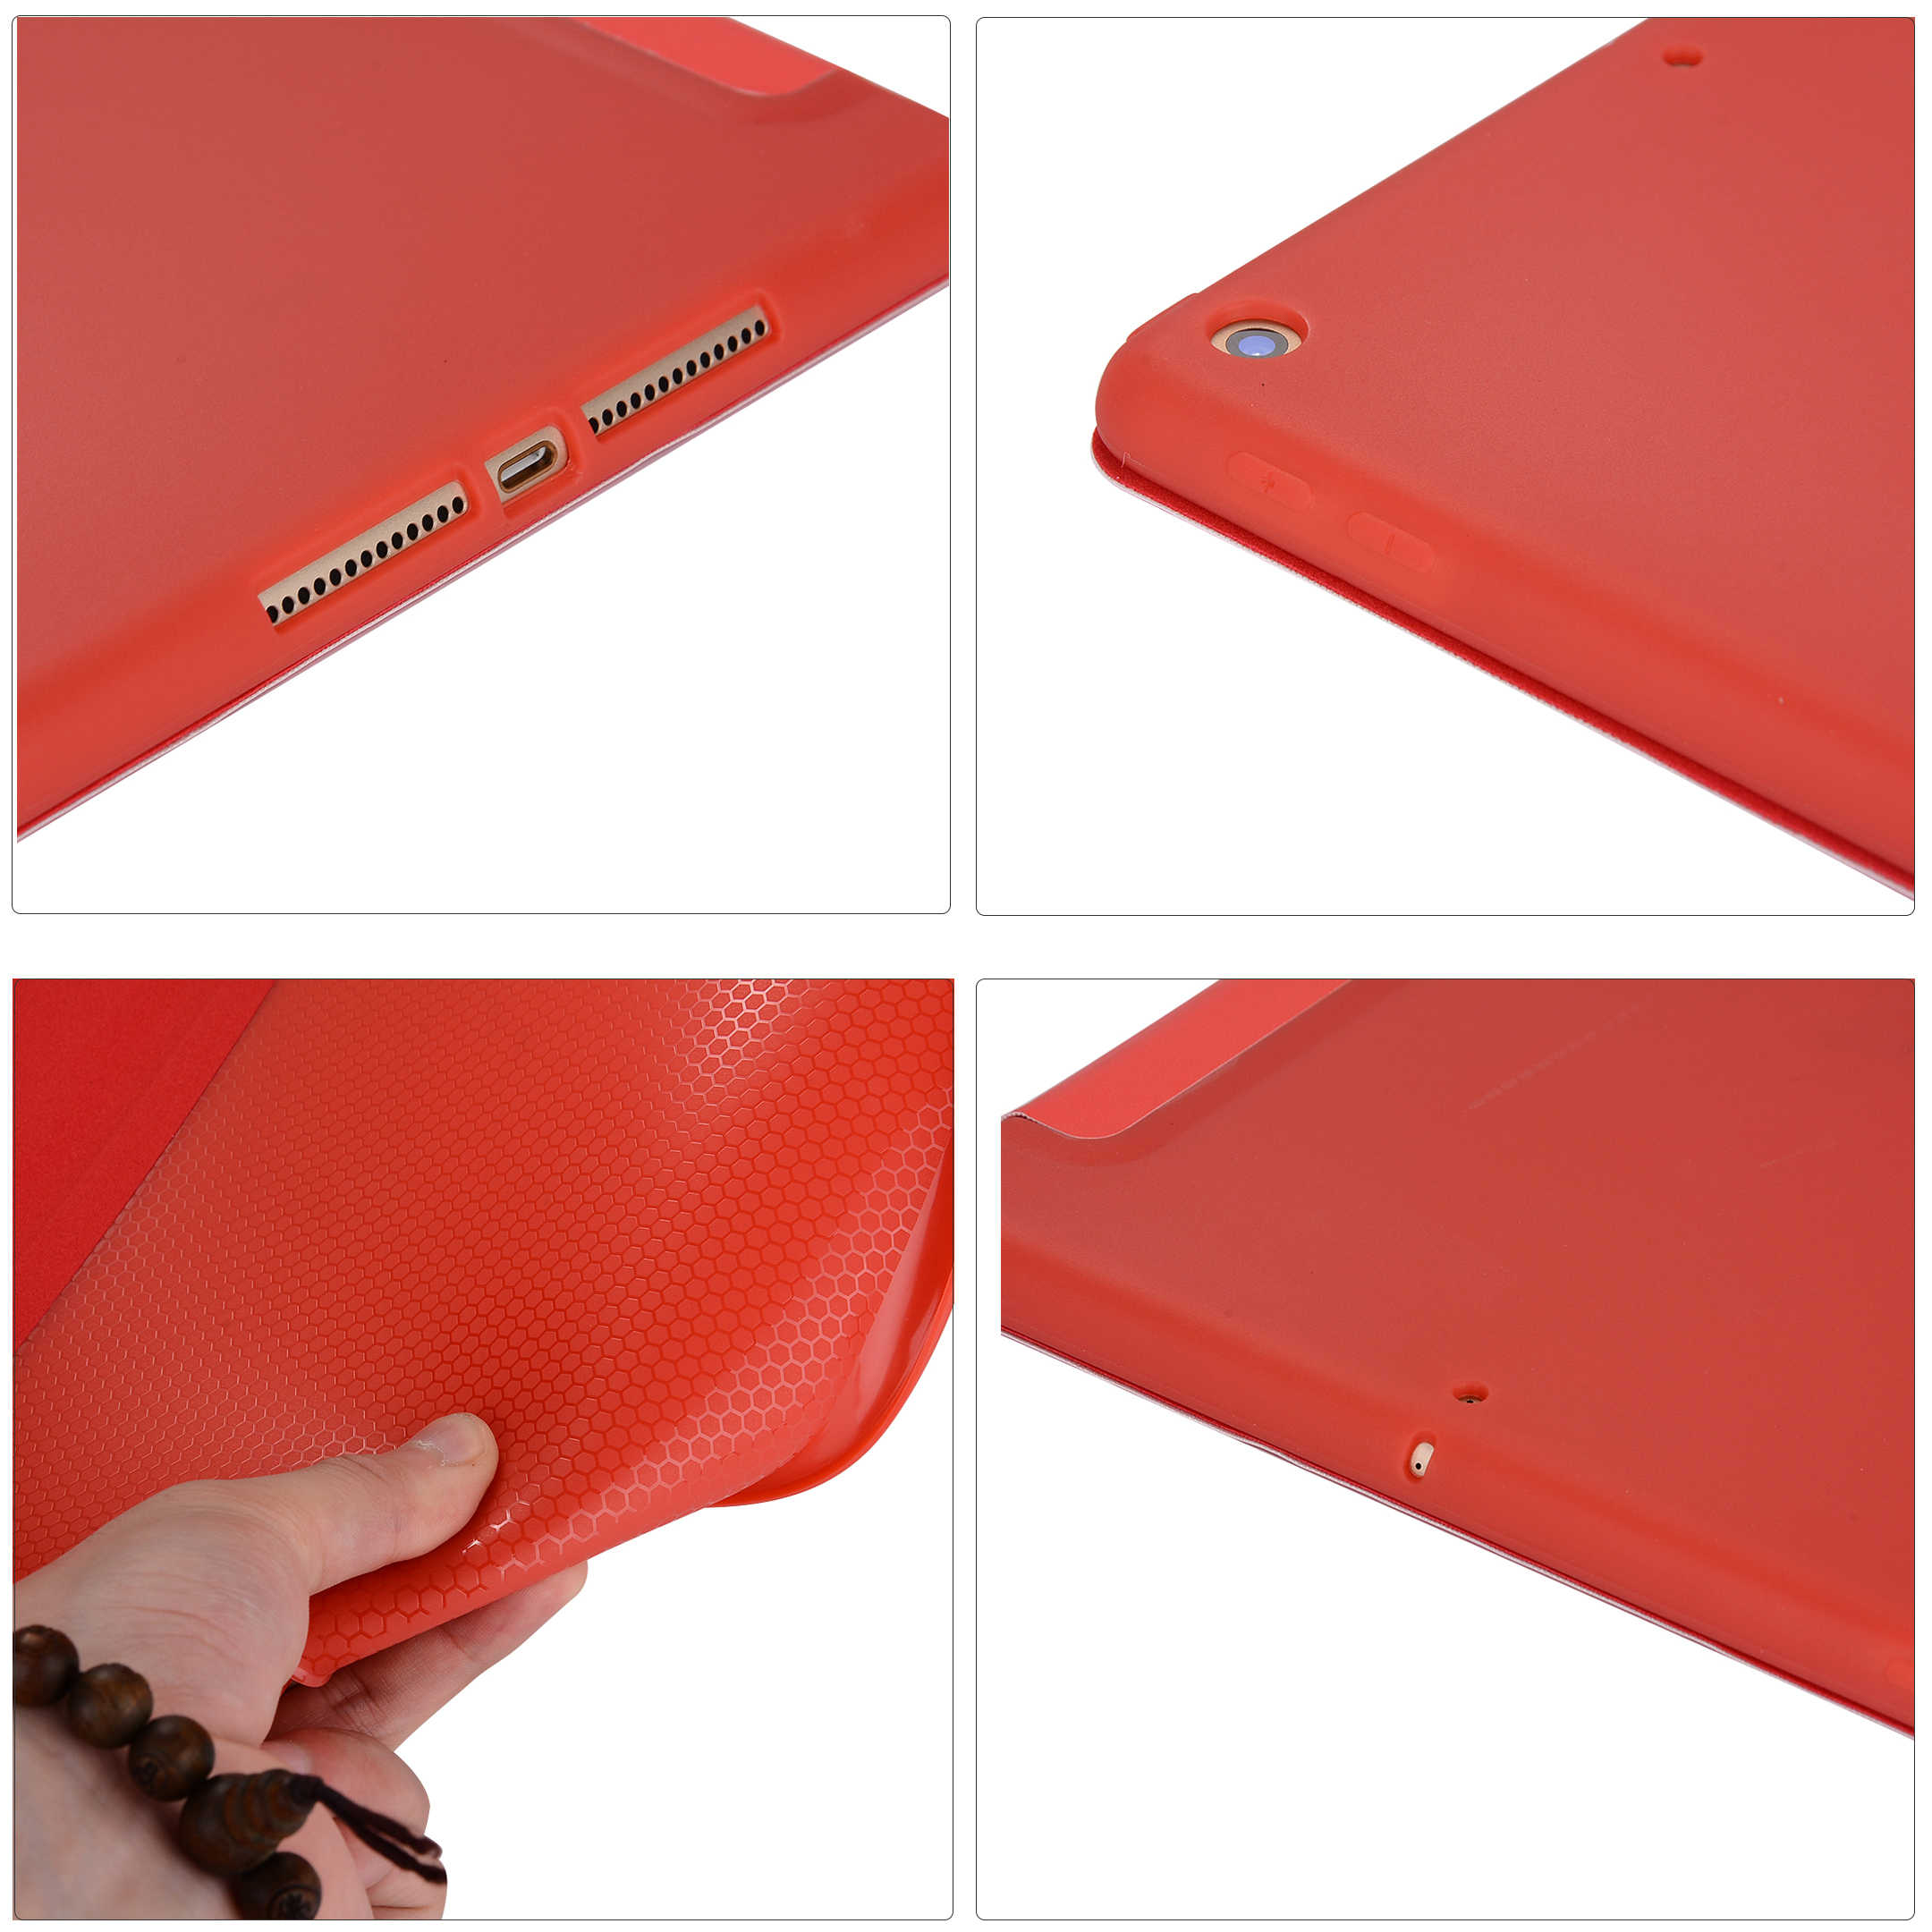 Rovtop Case Cover Voor Ipad 9.7 Air 2 Air 1 Pro 10.5 Case Silicone Soft Leather Smart Case Cover Voor 2017 2018 Generatie Funda